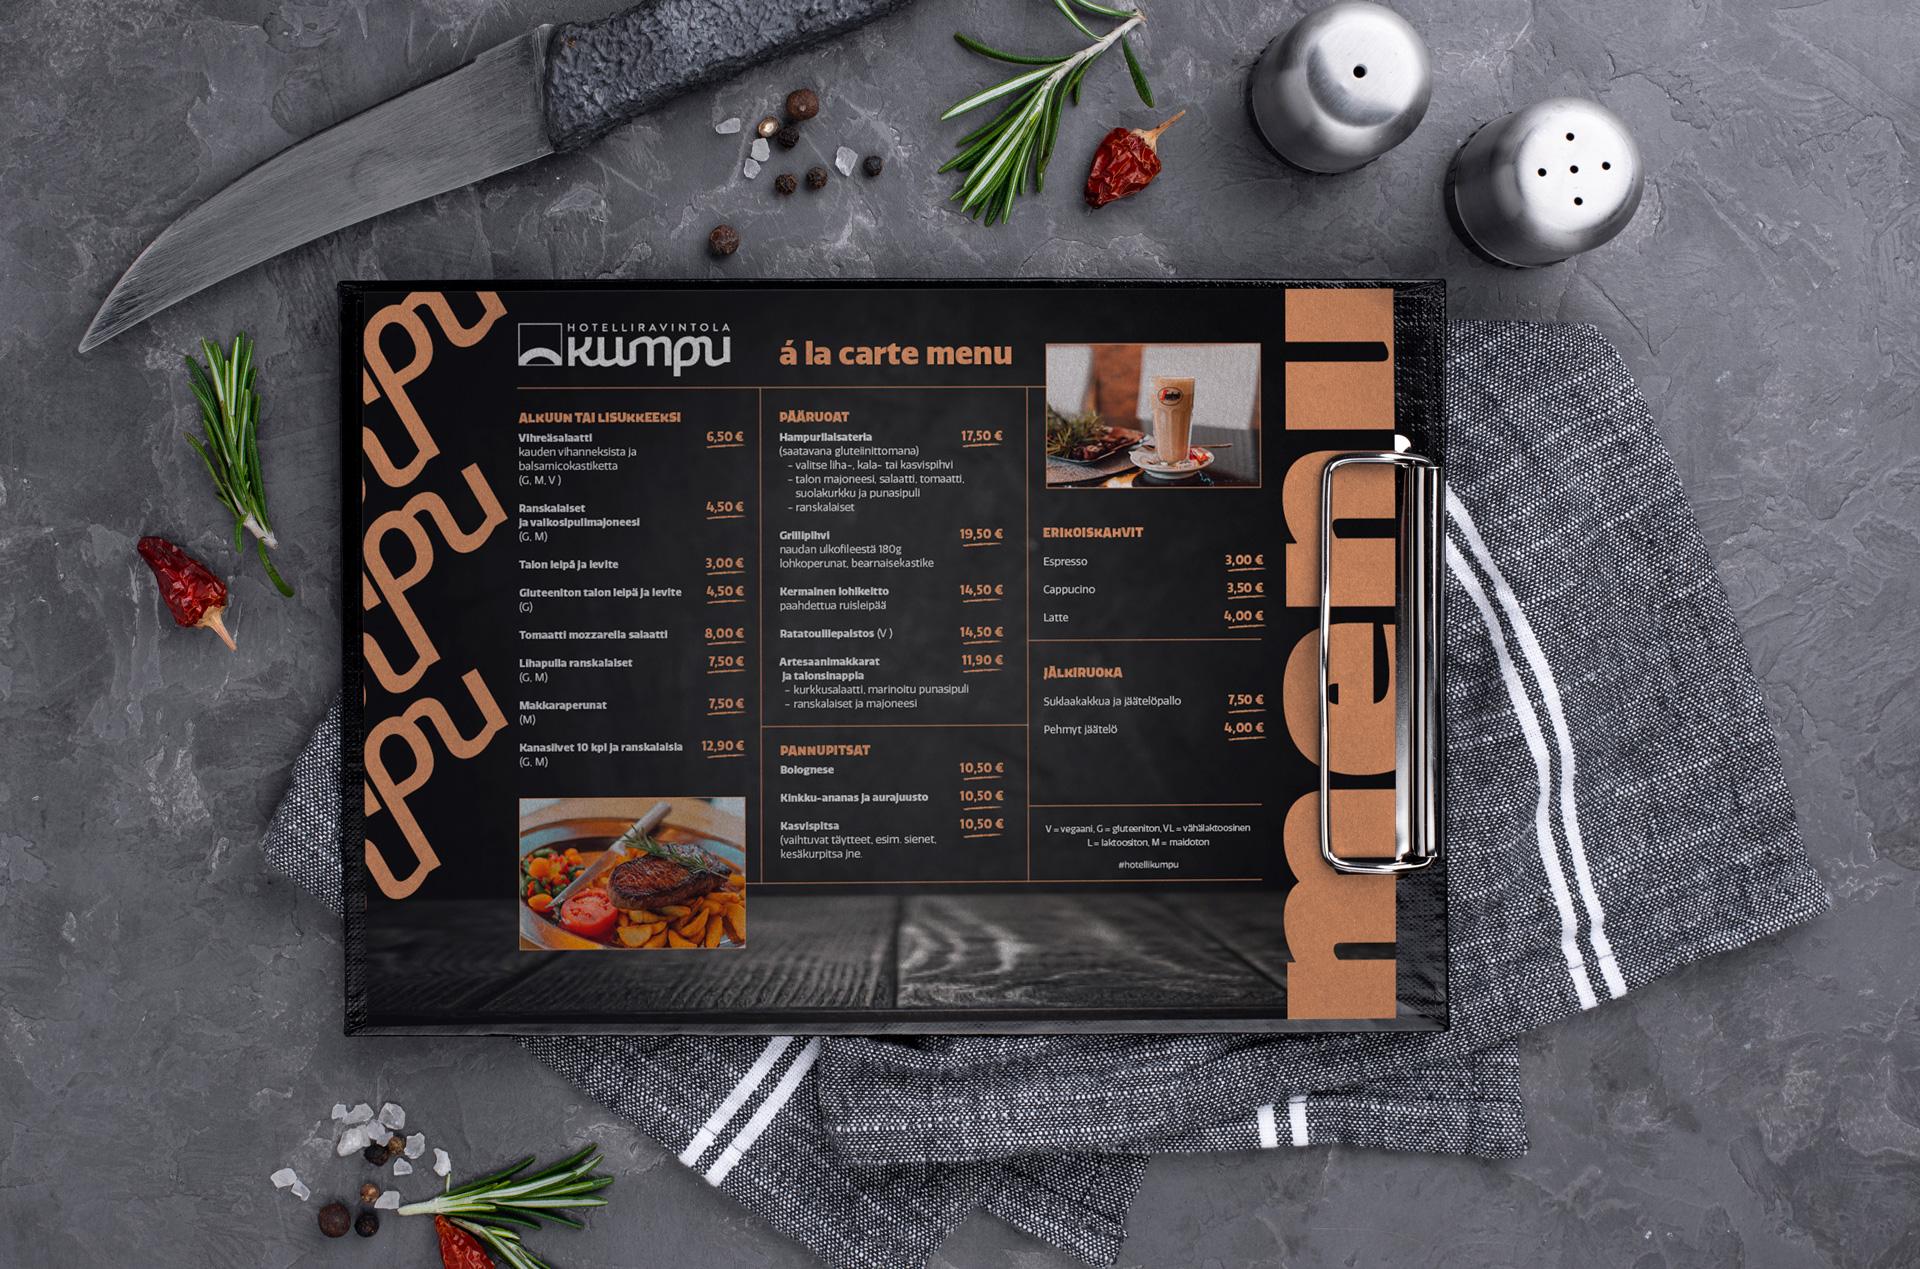 Hotelliravintola kumpu á la carte menu